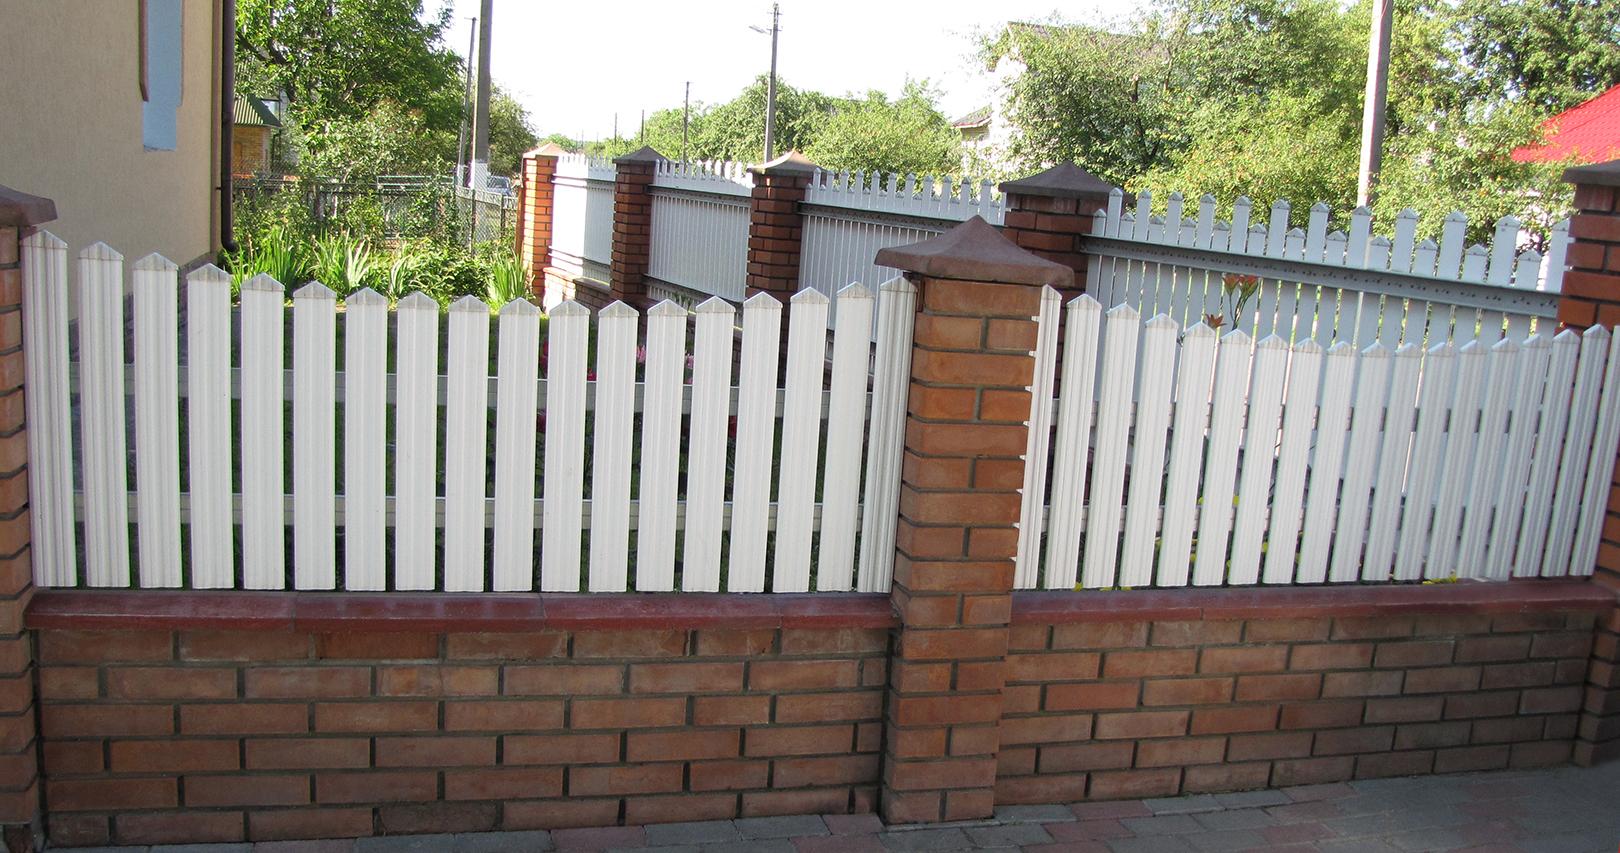 pflegeleicht widerstandsf/ähiges Hart-PVC Kunststoffzaun 80 x 16 mm Balkonbretter wei/ß modern Zaunlatten Sparpaket PZL-01 Hexim 30 Meter